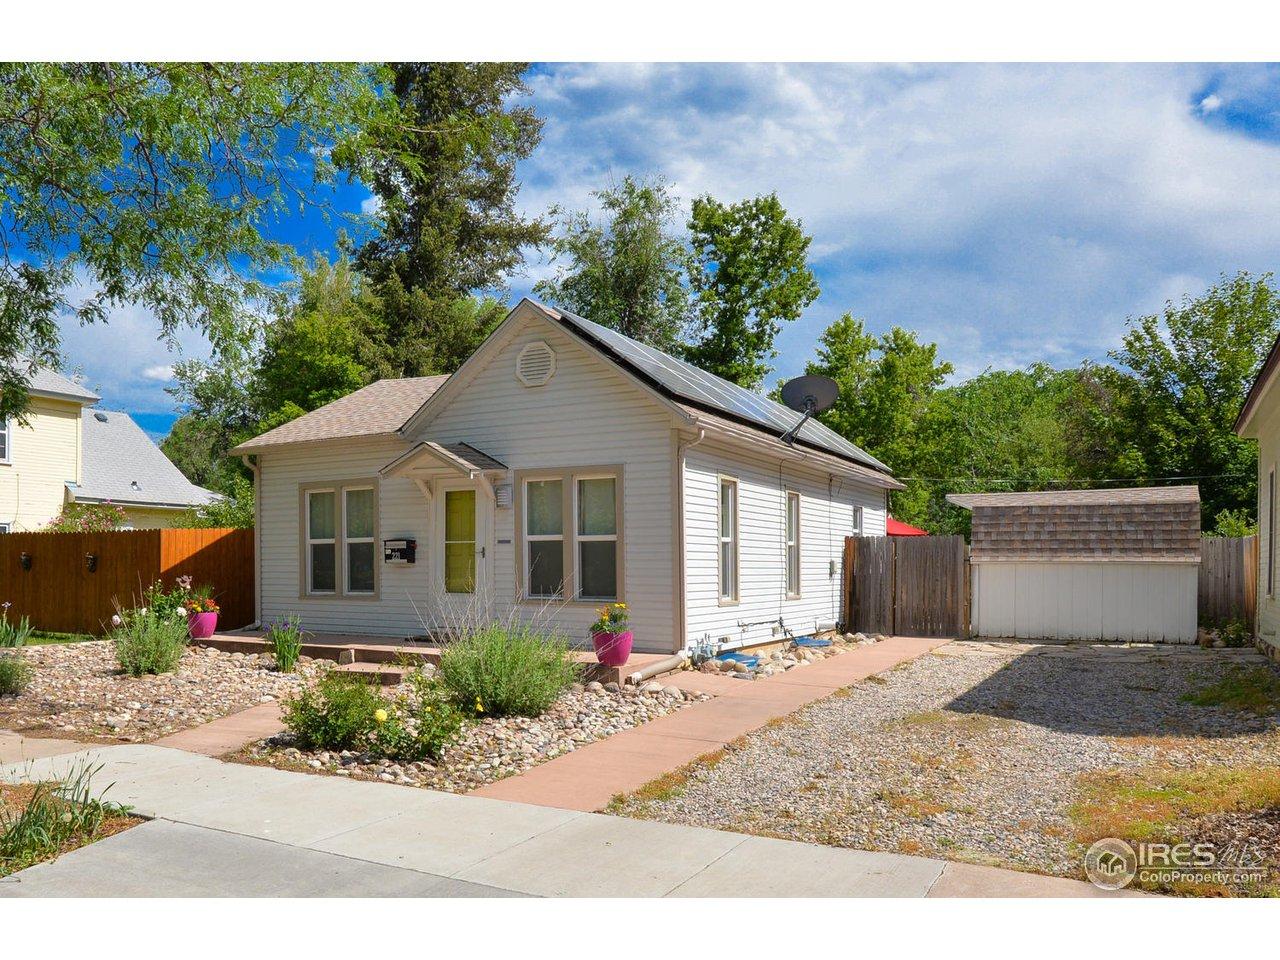 221 Edwards St, Fort Collins CO 80524